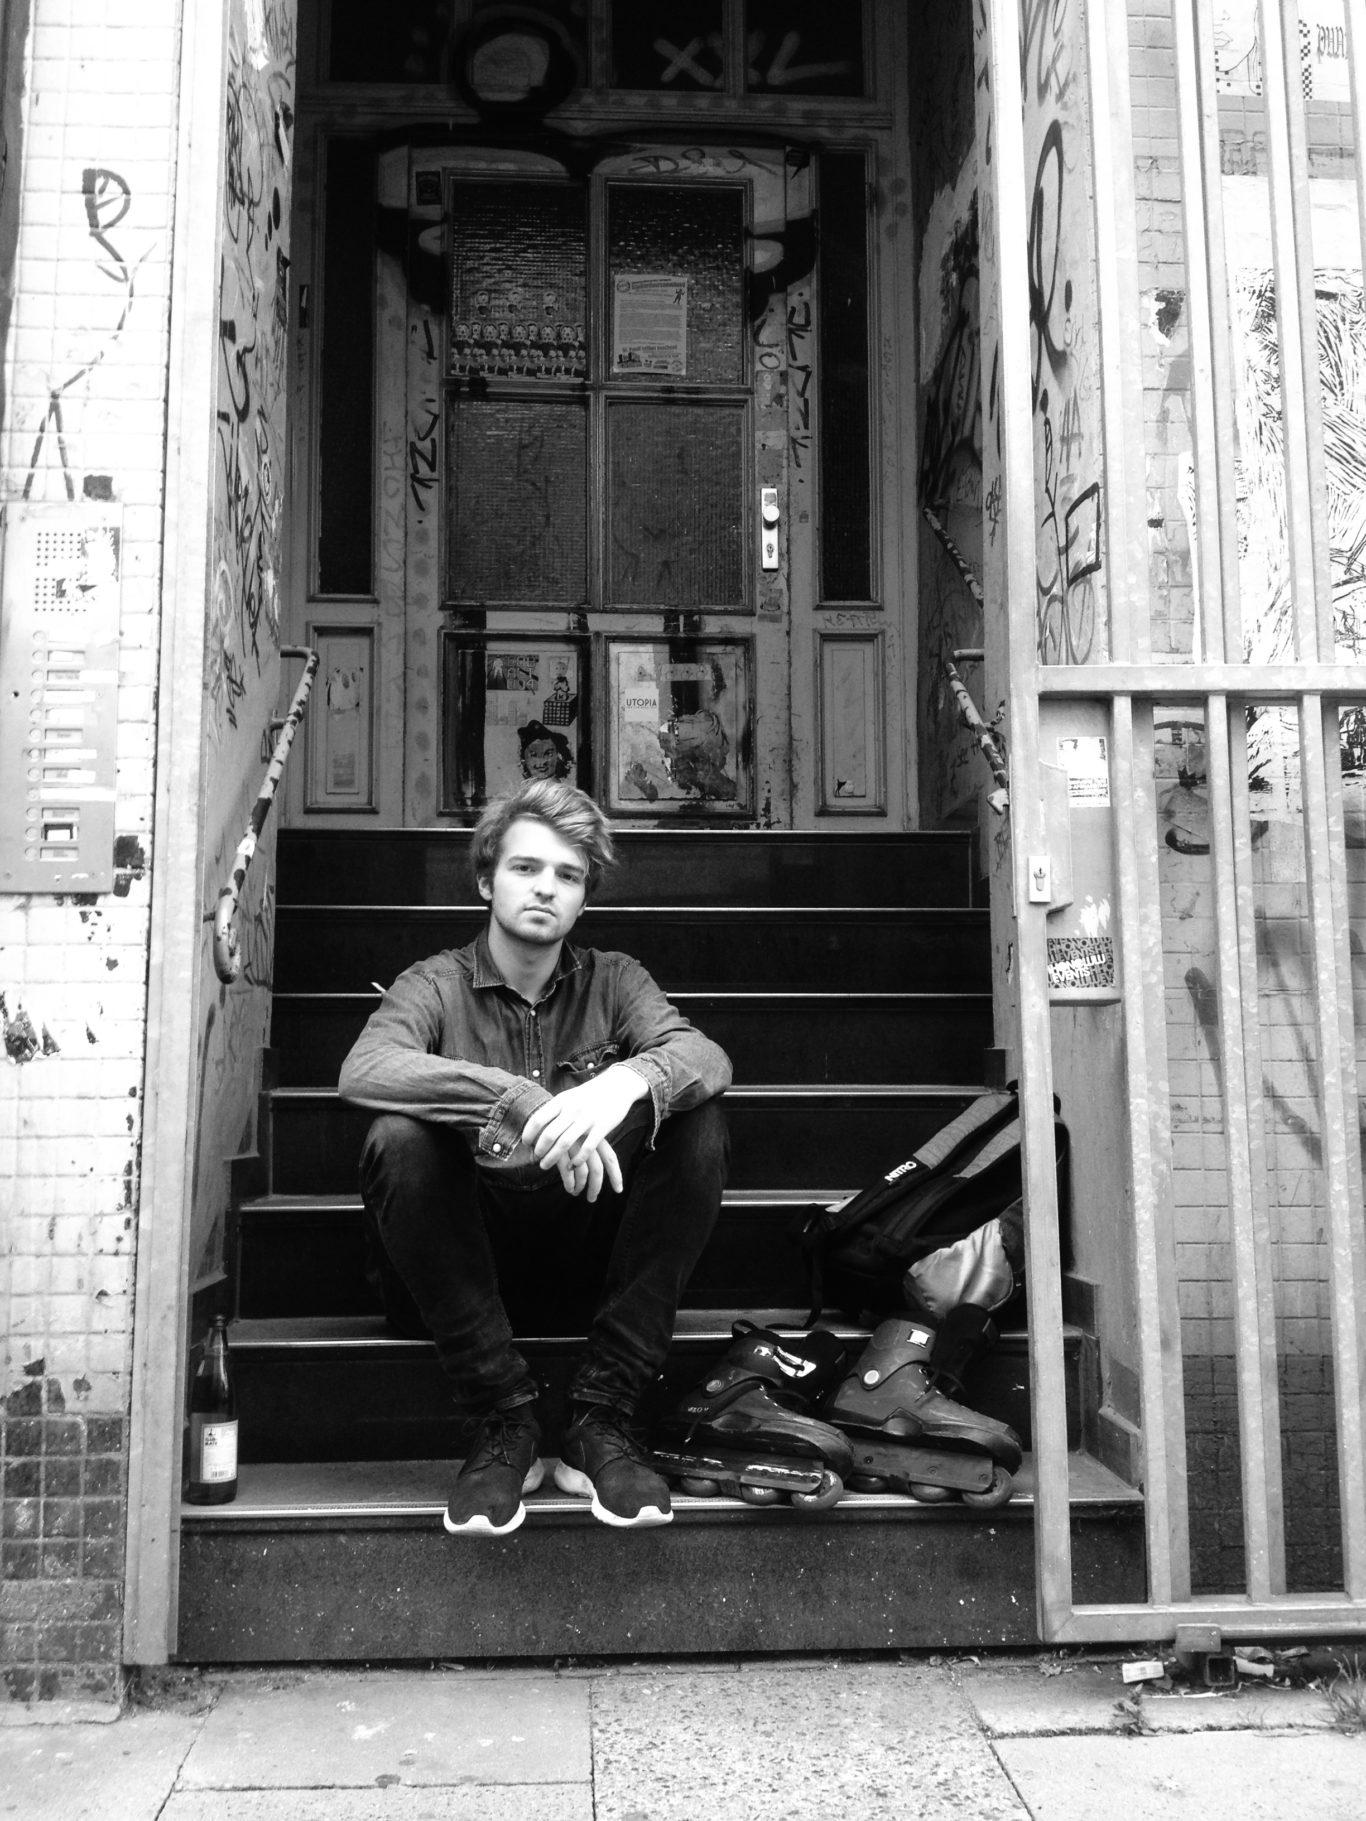 Photo: Benny Urban